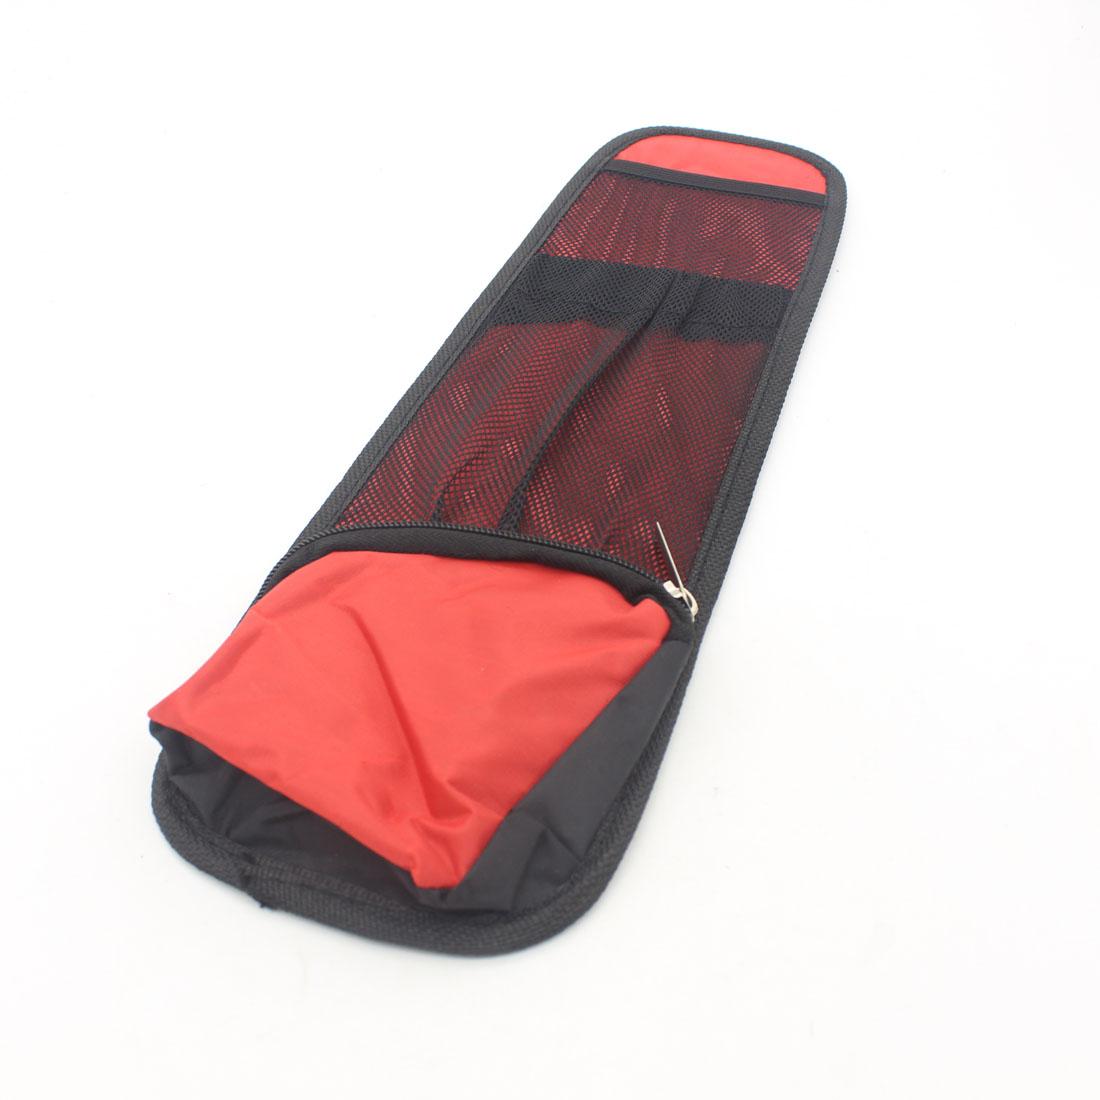 Malibu Chair Reviews Online Shopping Malibu Chair